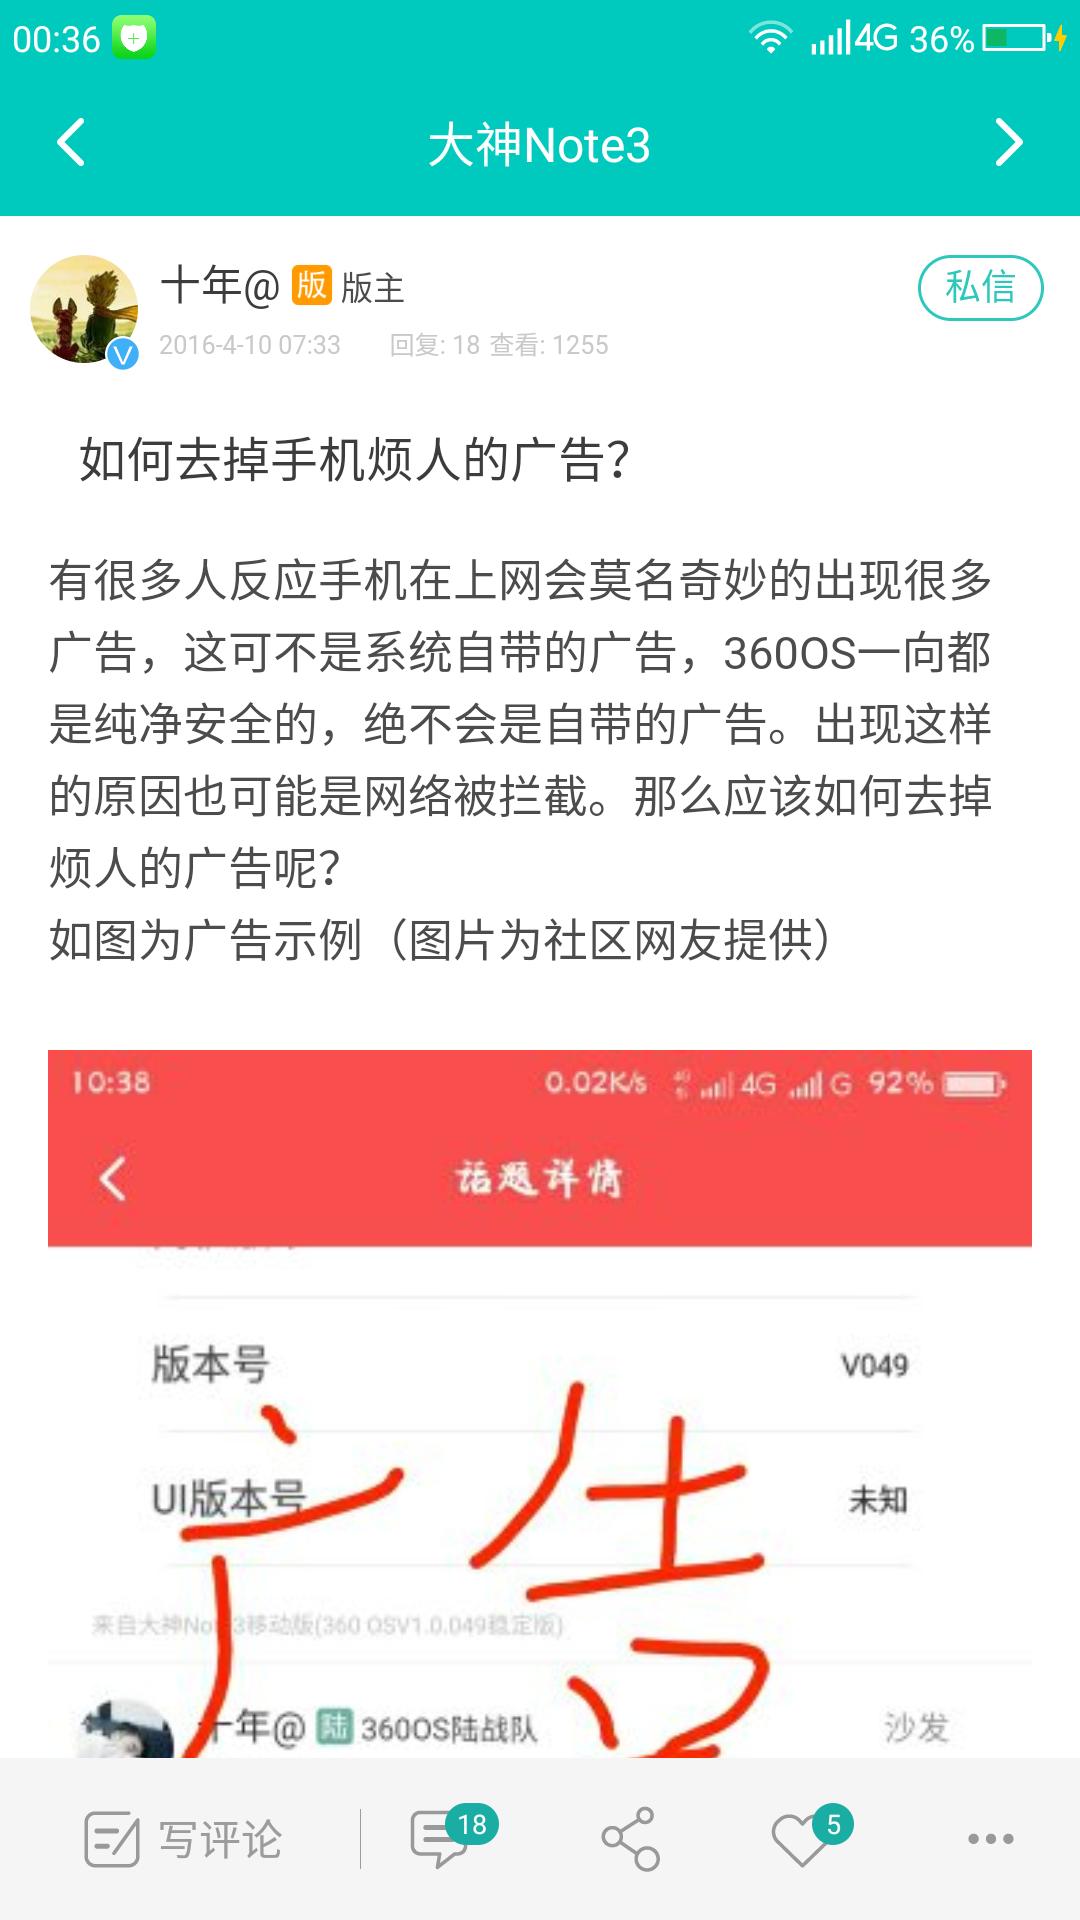 Screenshot_2018-03-01-00-36-21.png